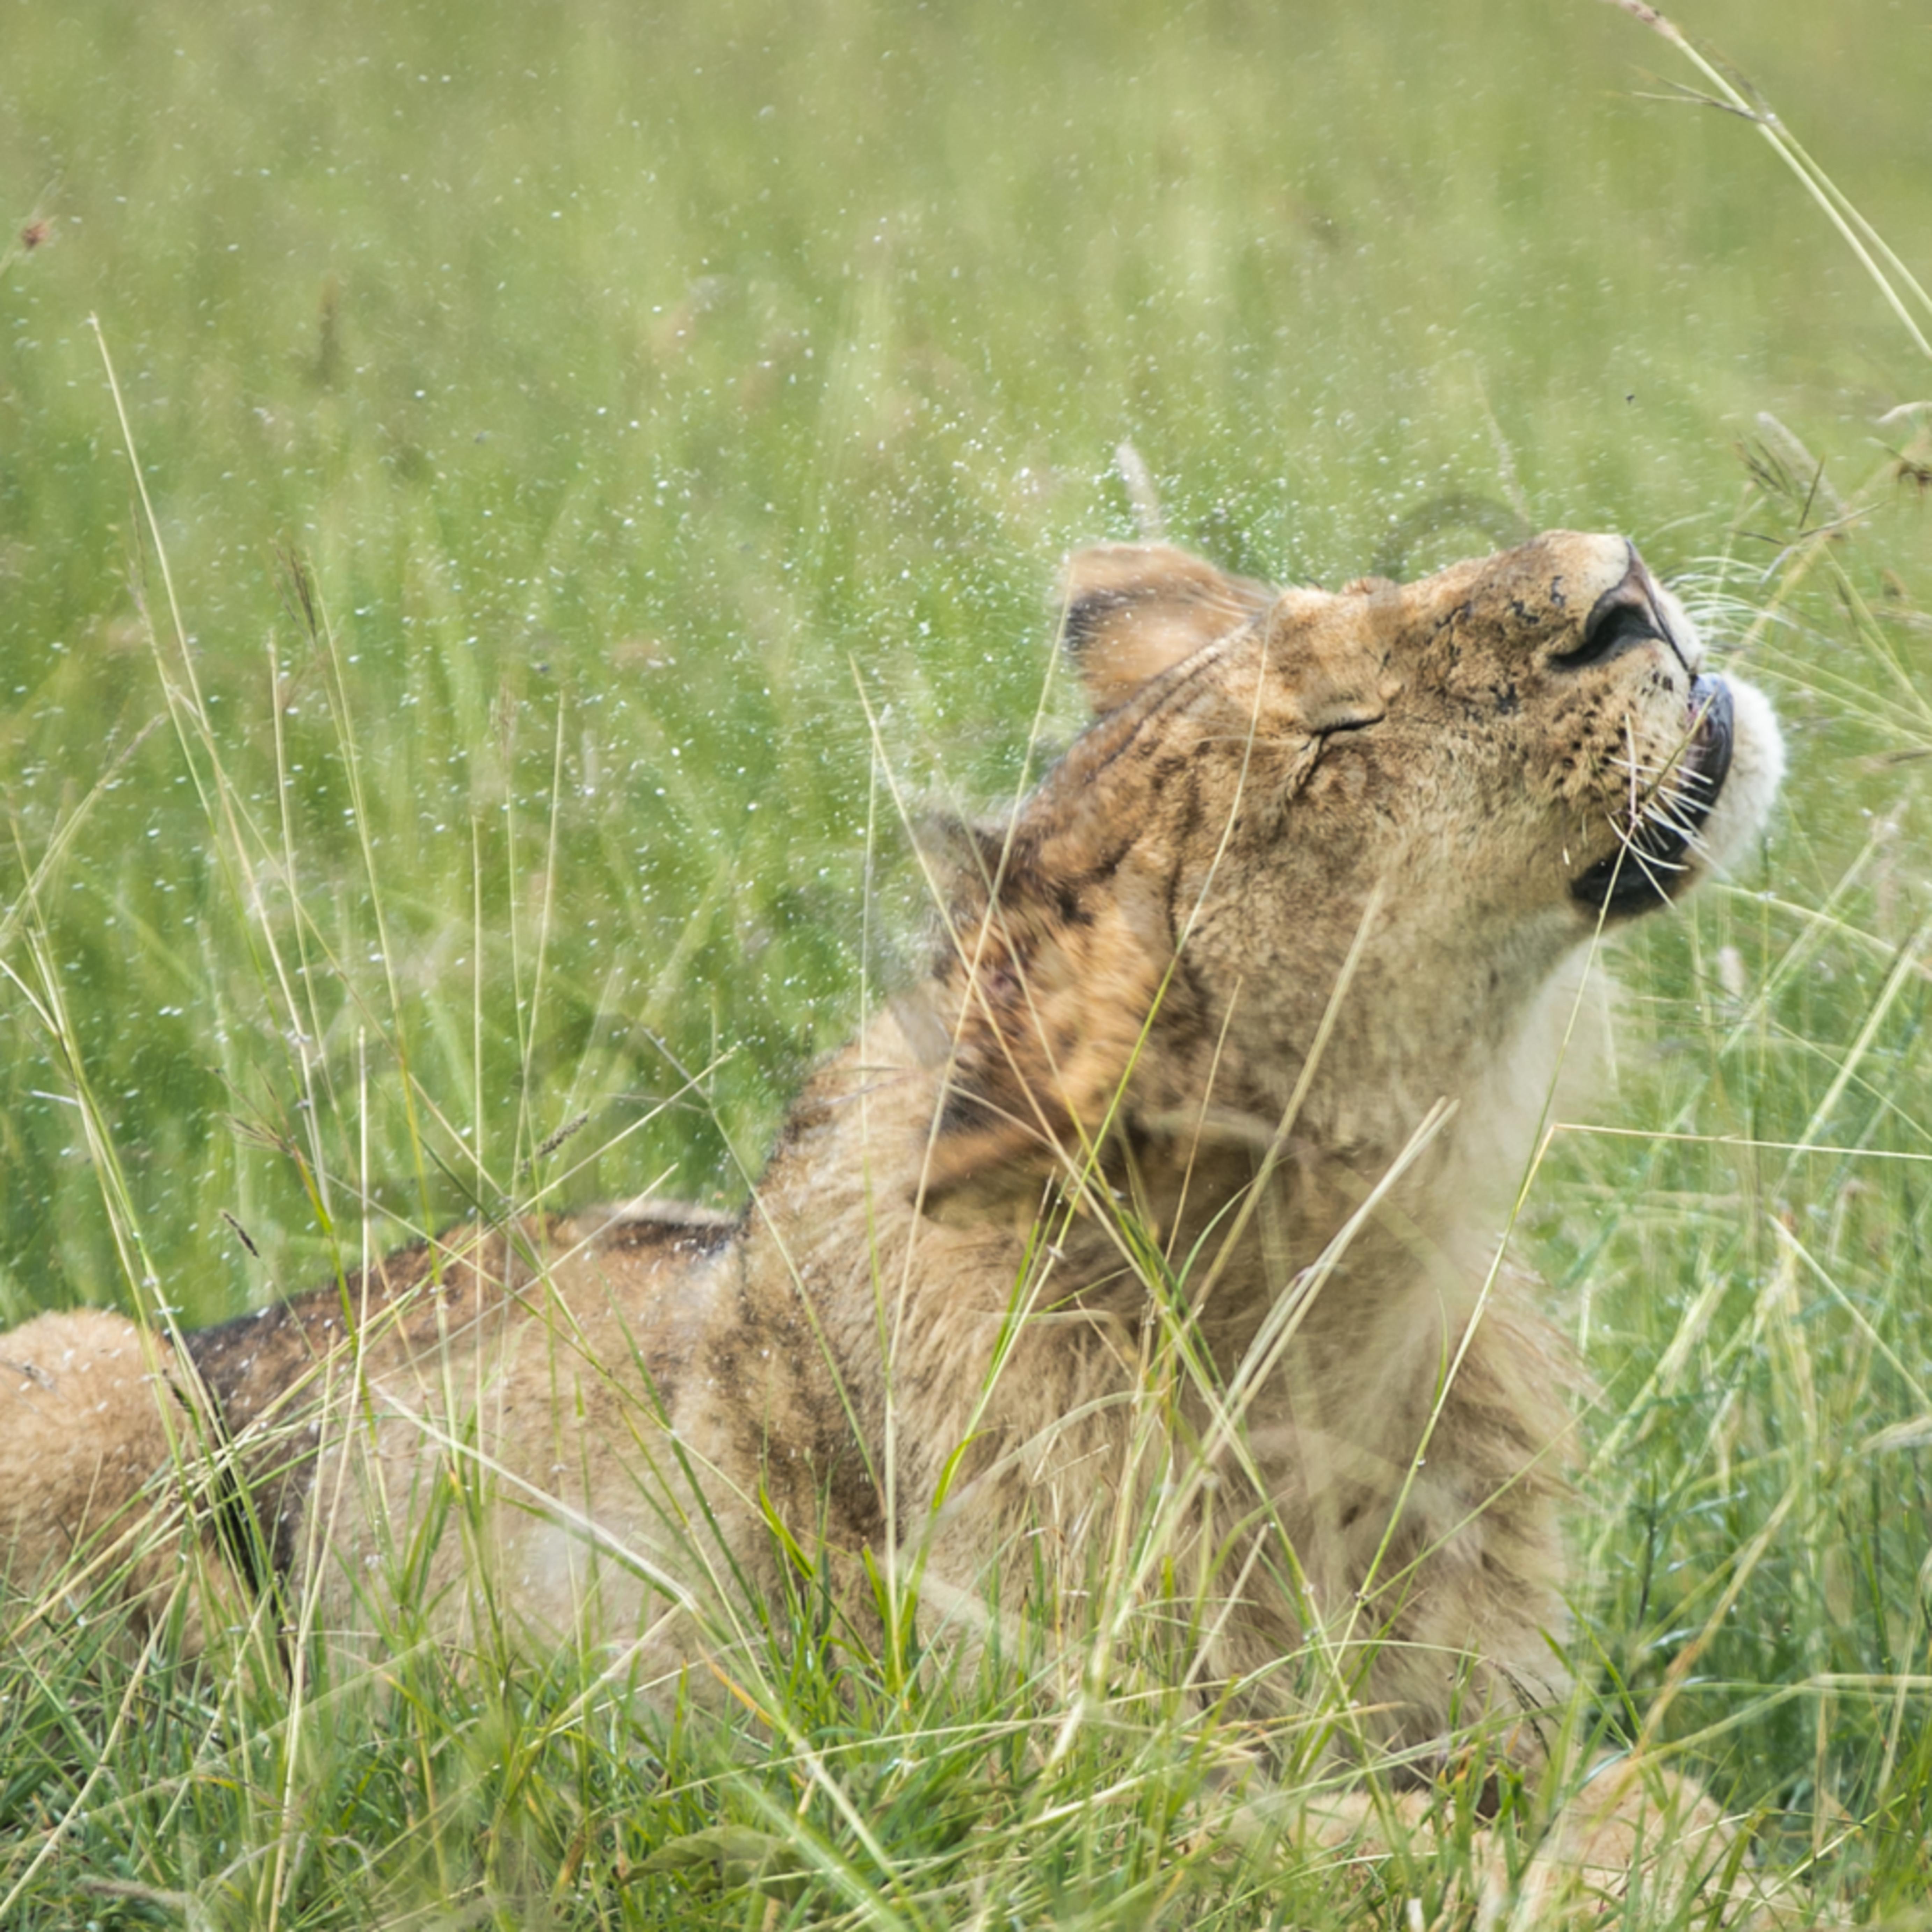 Lionshakingoffrain pqurg5